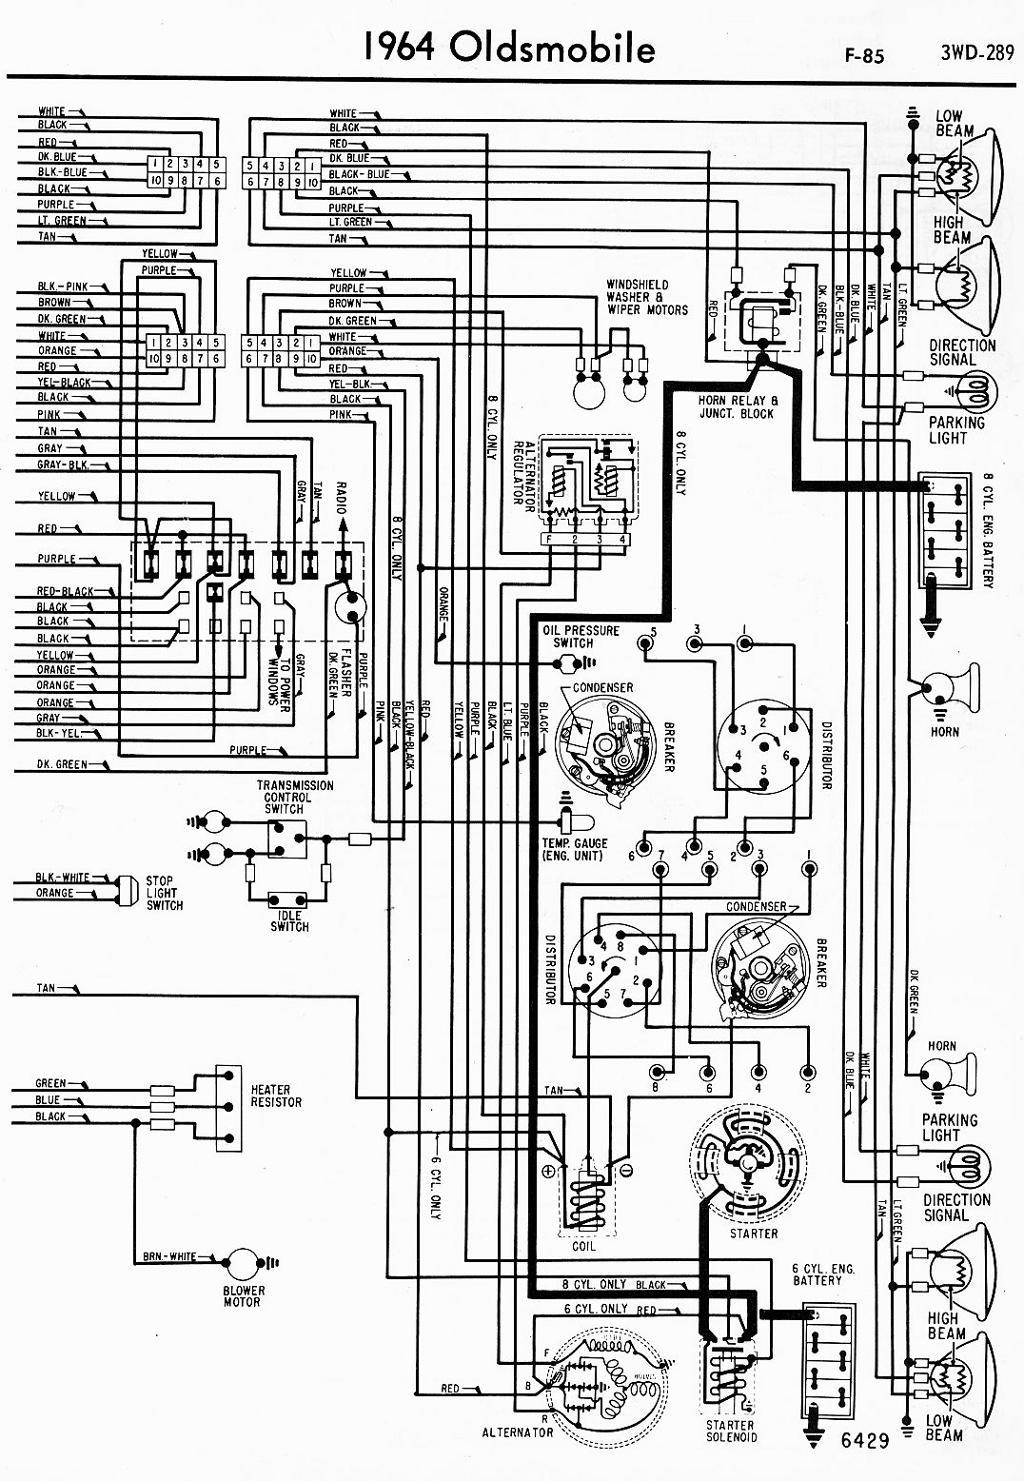 1967 Oldsmobile Cutlass Wiring Diagrams Guide And Troubleshooting 68 Diagram Toronado Library Rh 50 Skriptoase De